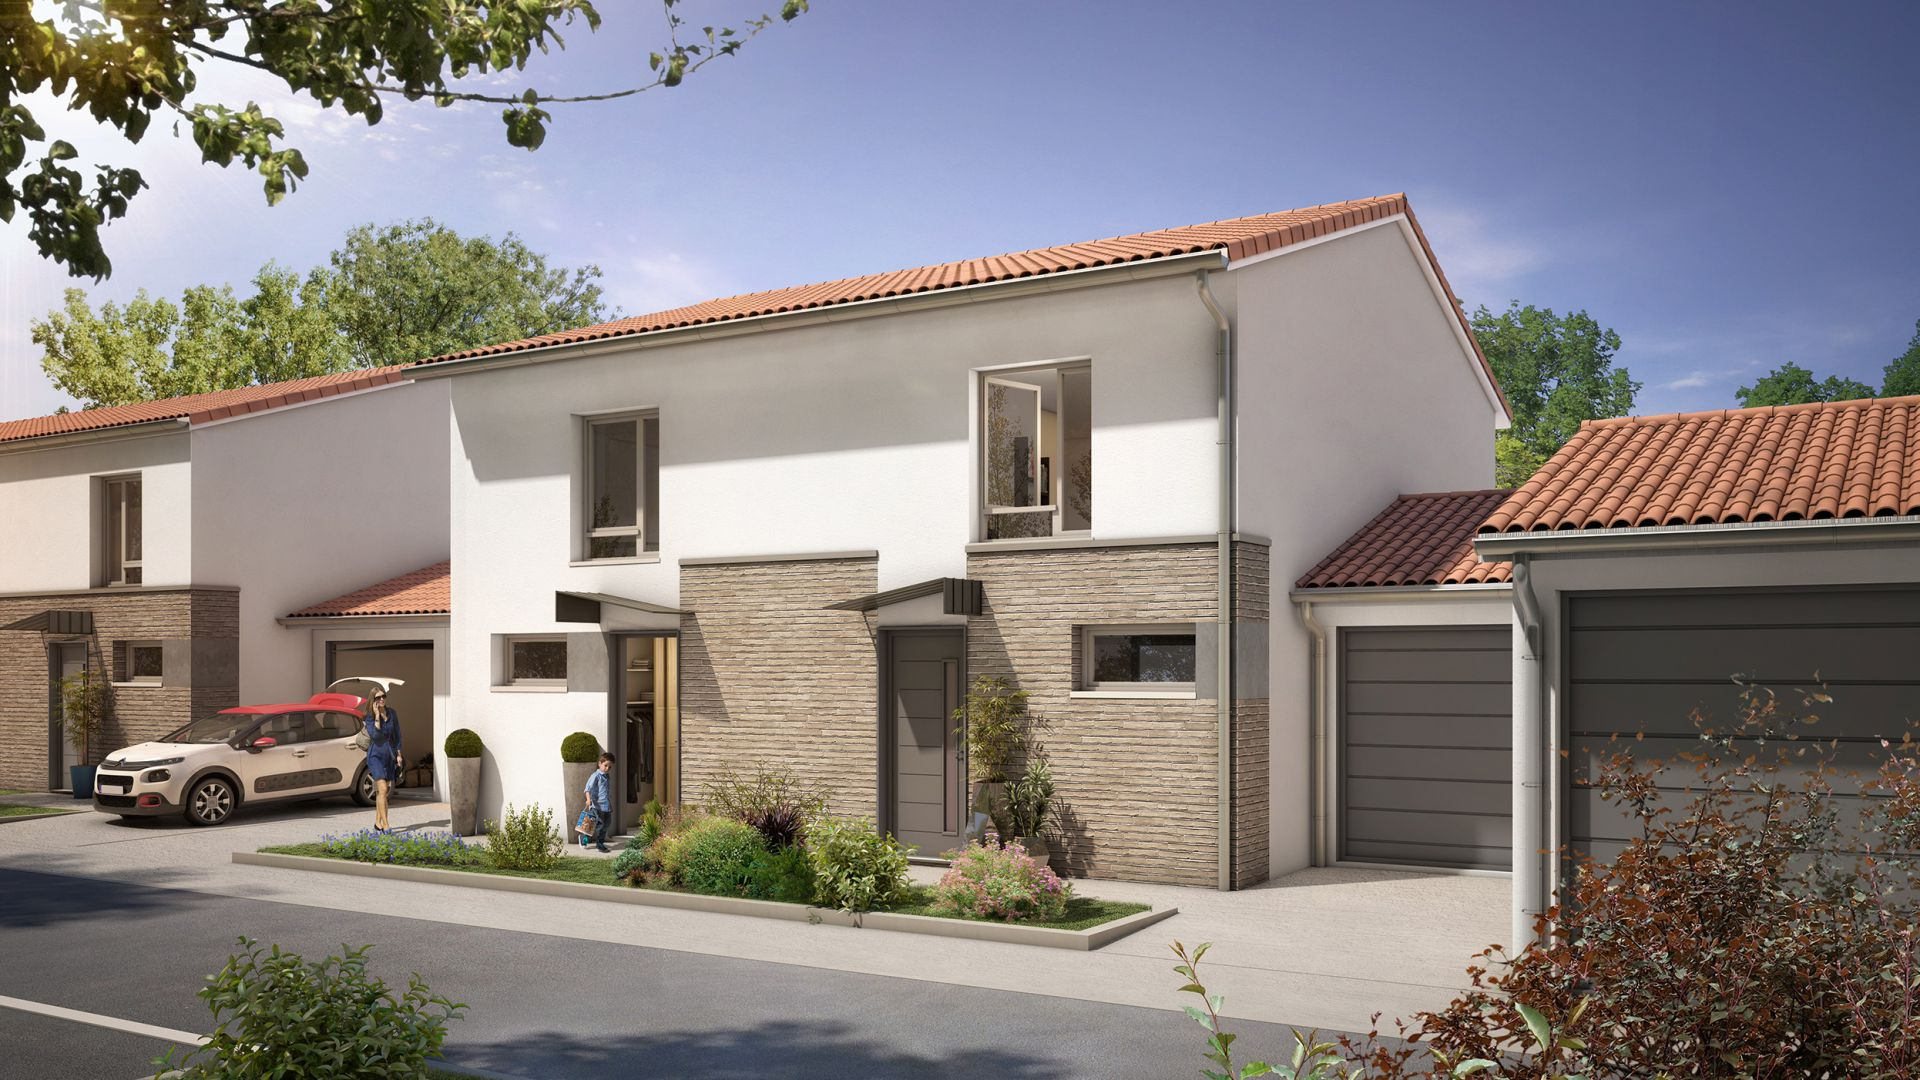 GreenCity Immobilier-La Bastide D'Adèle-Tournefeuille-31170-Villa T3